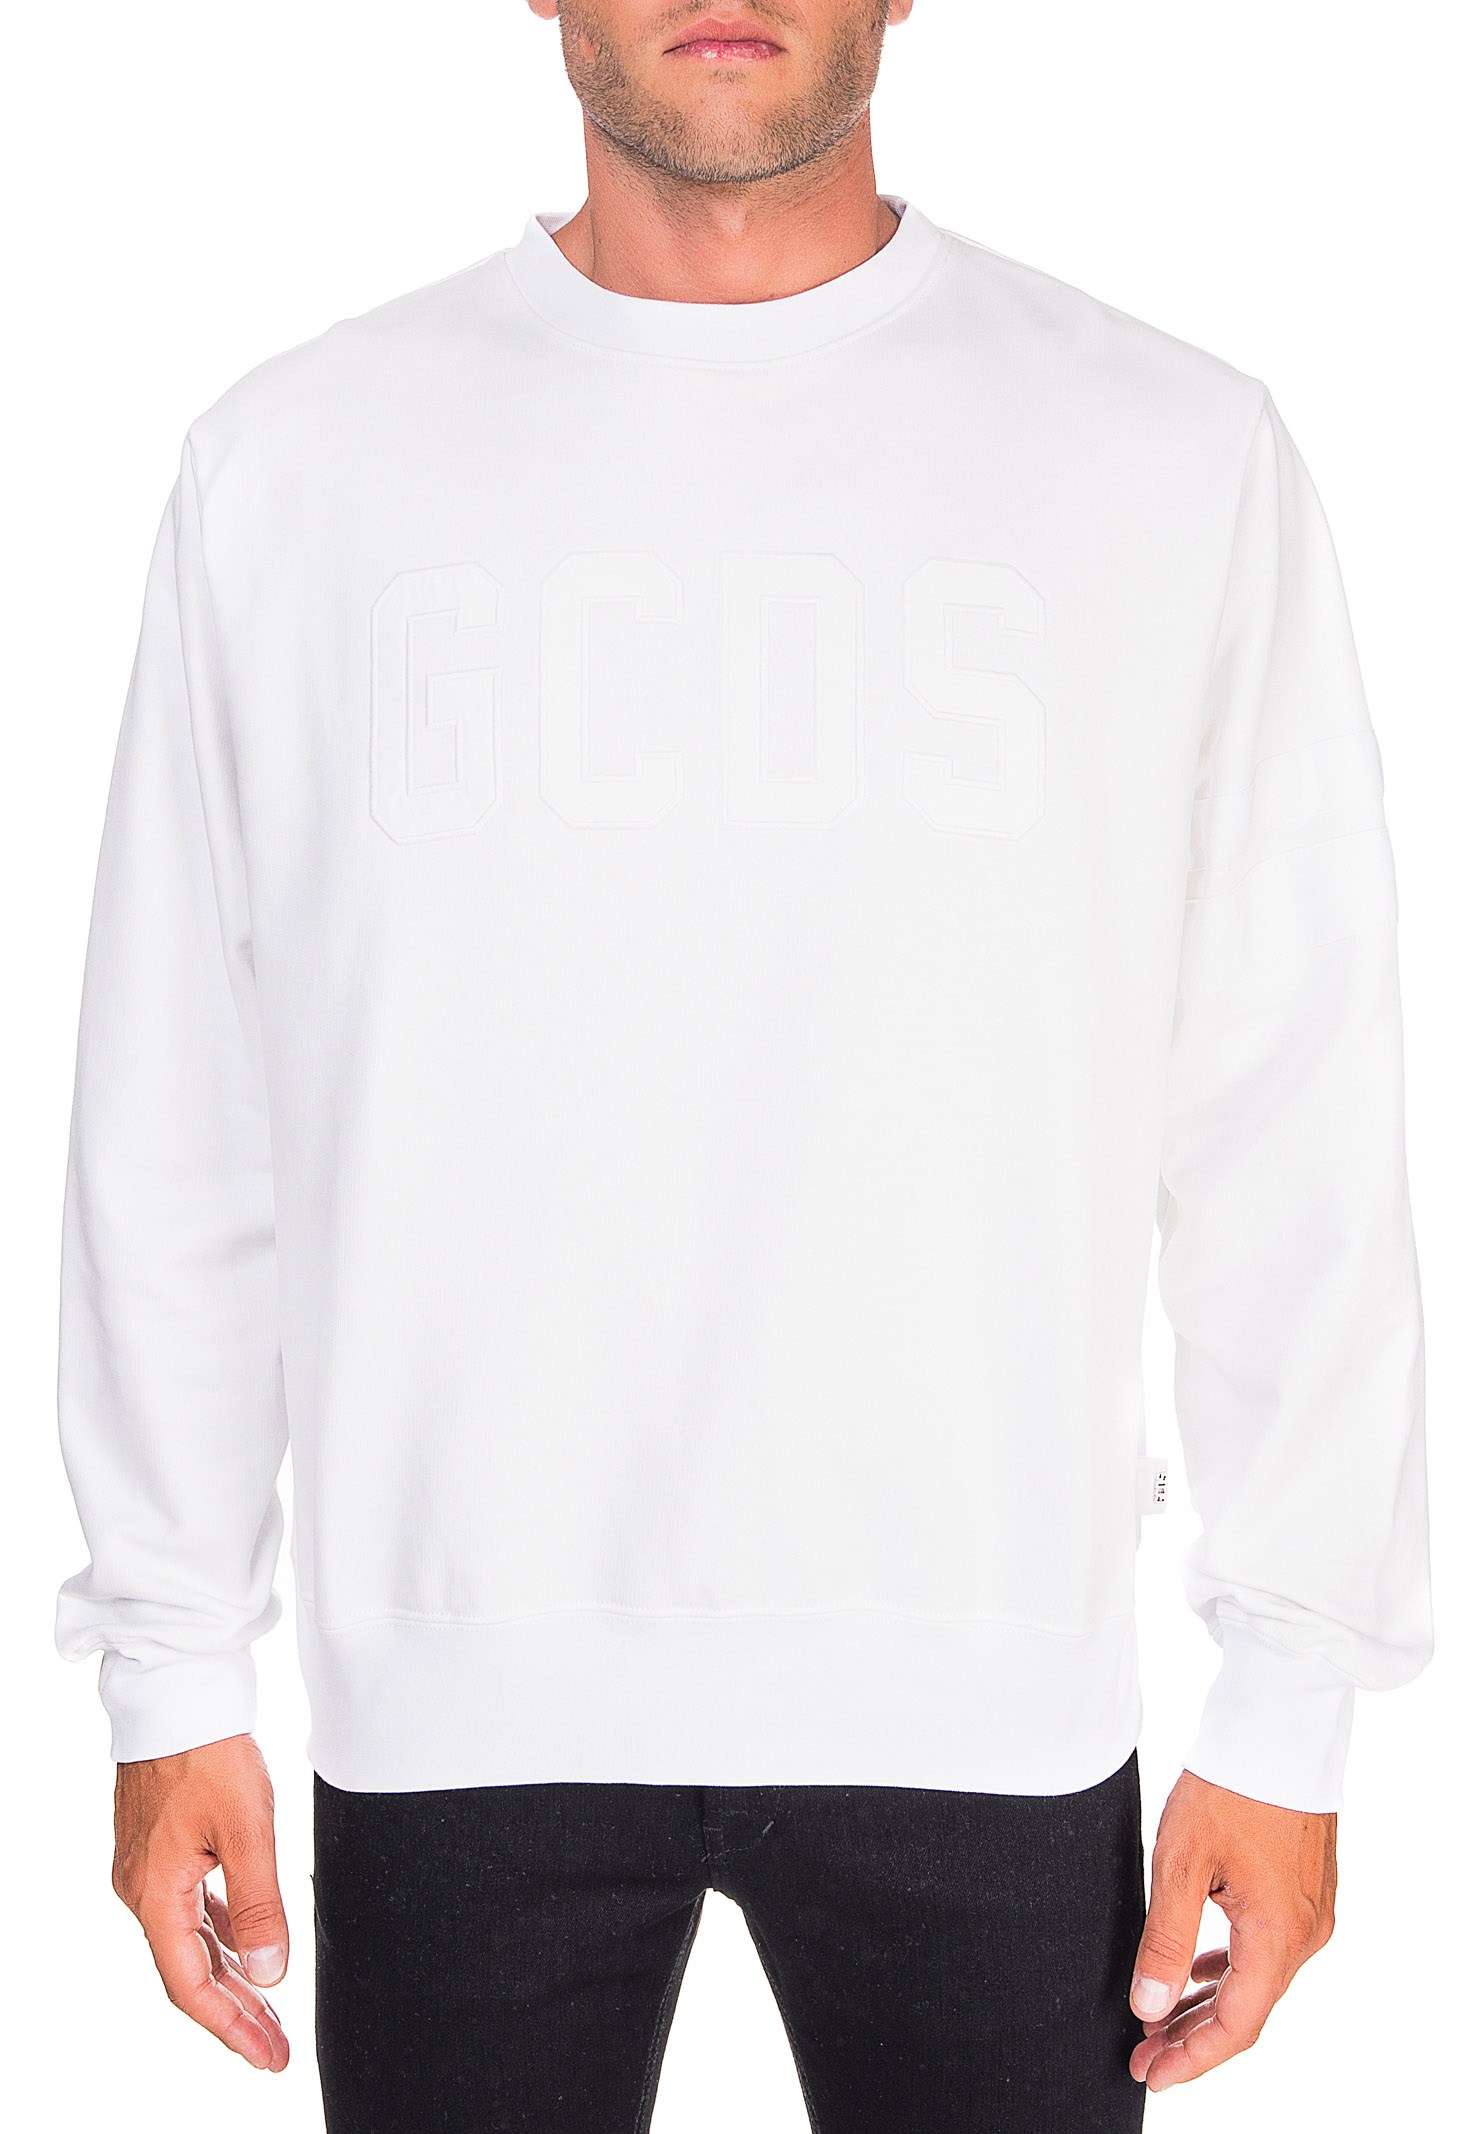 WHITE COTTON SWEATSHIRT WITH FRONT LOGO GCDS | Sweatshirts | CC94M021003BIANCO